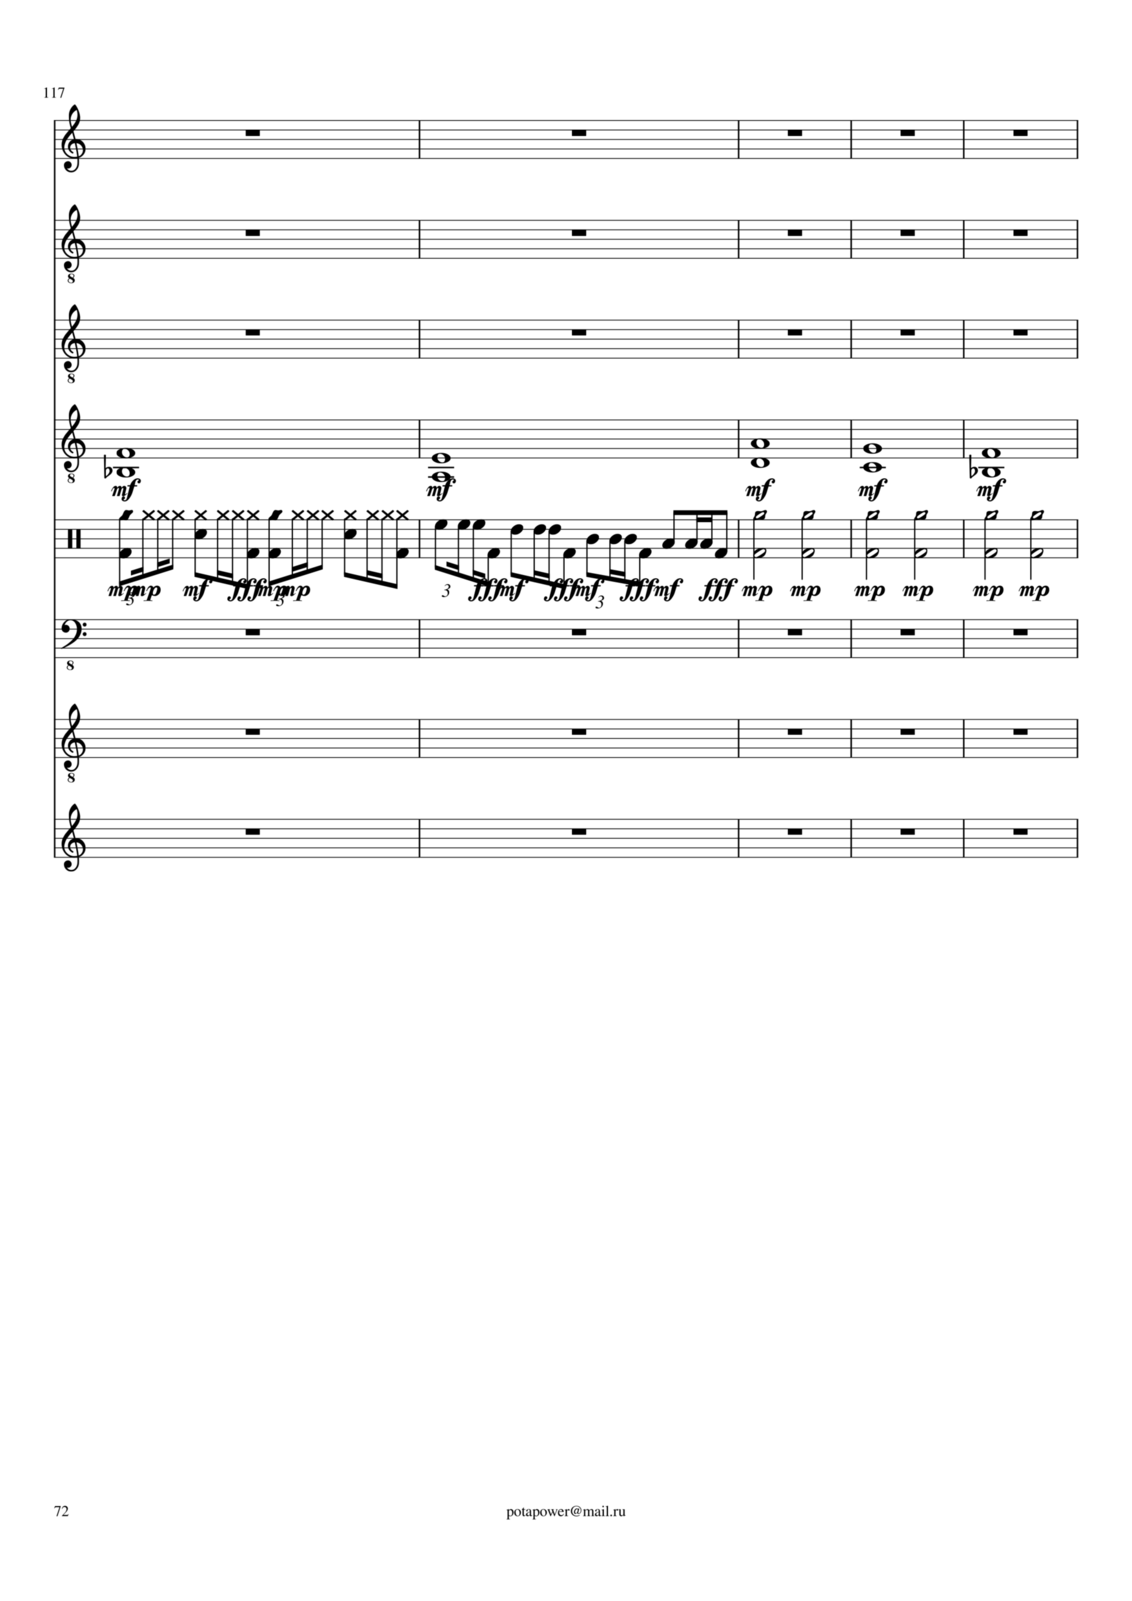 Korolevstvo slez slide, Image 72